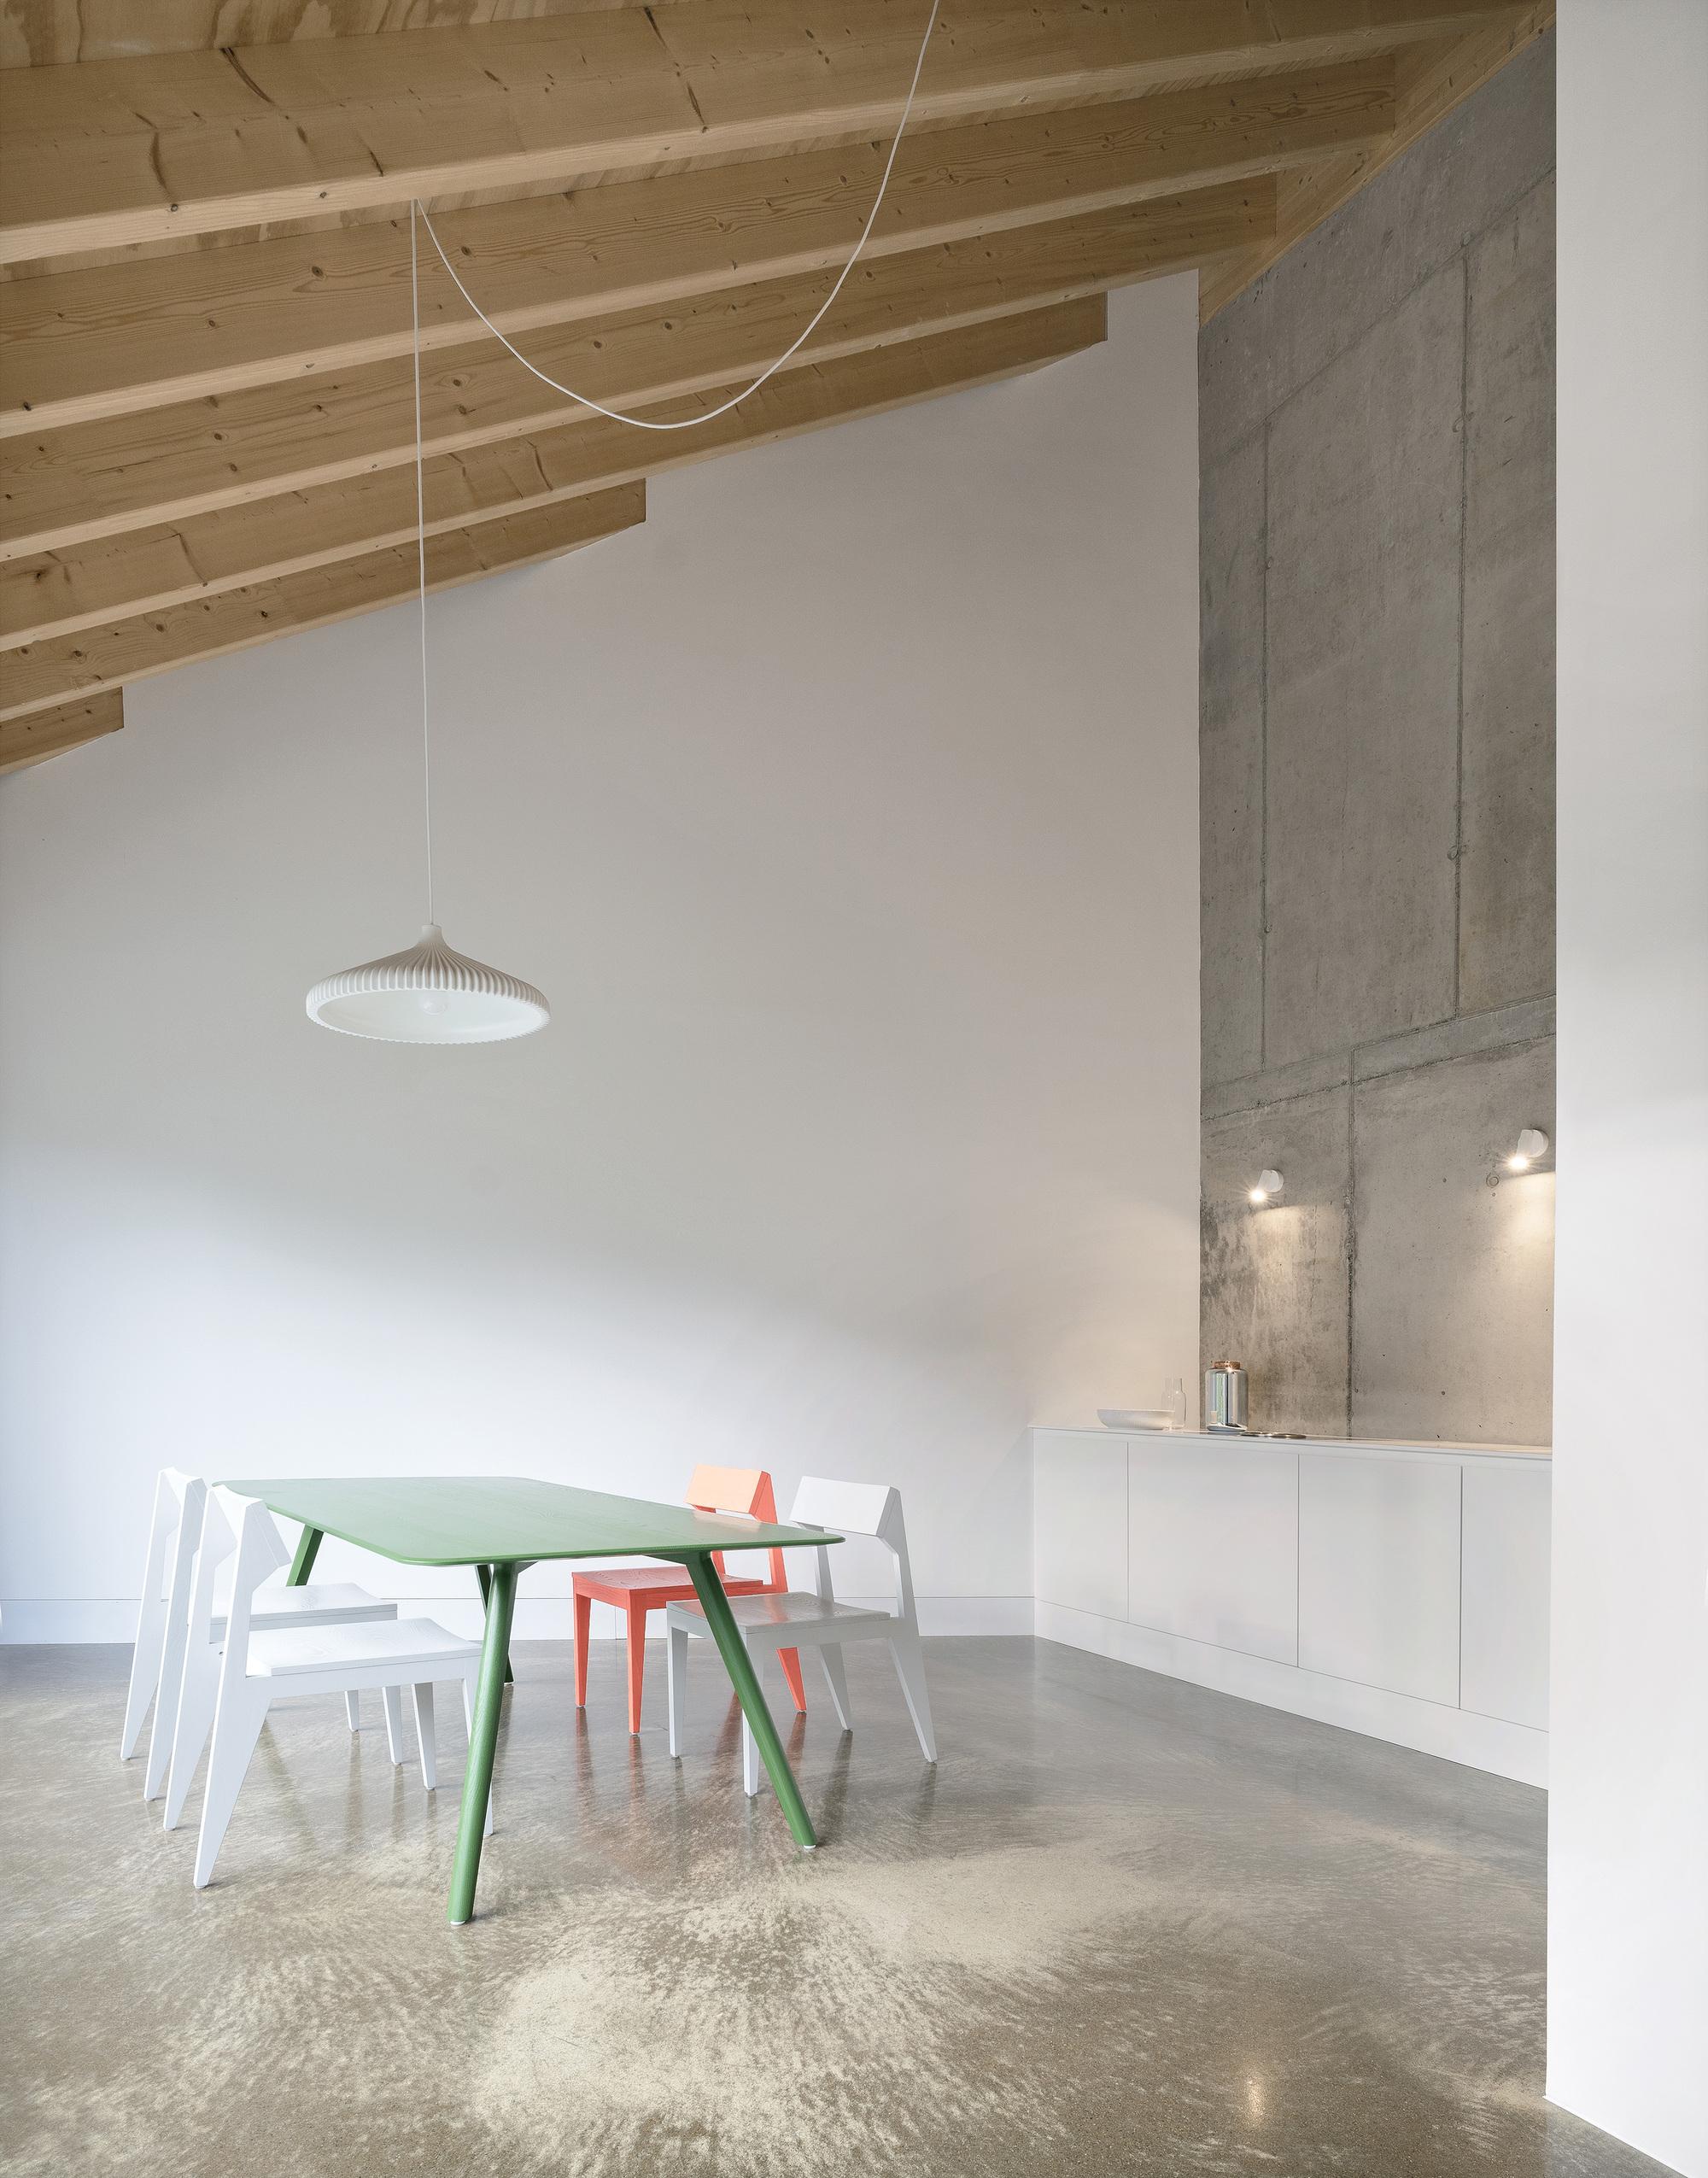 gallery of haus d yonder architektur und design 19. Black Bedroom Furniture Sets. Home Design Ideas